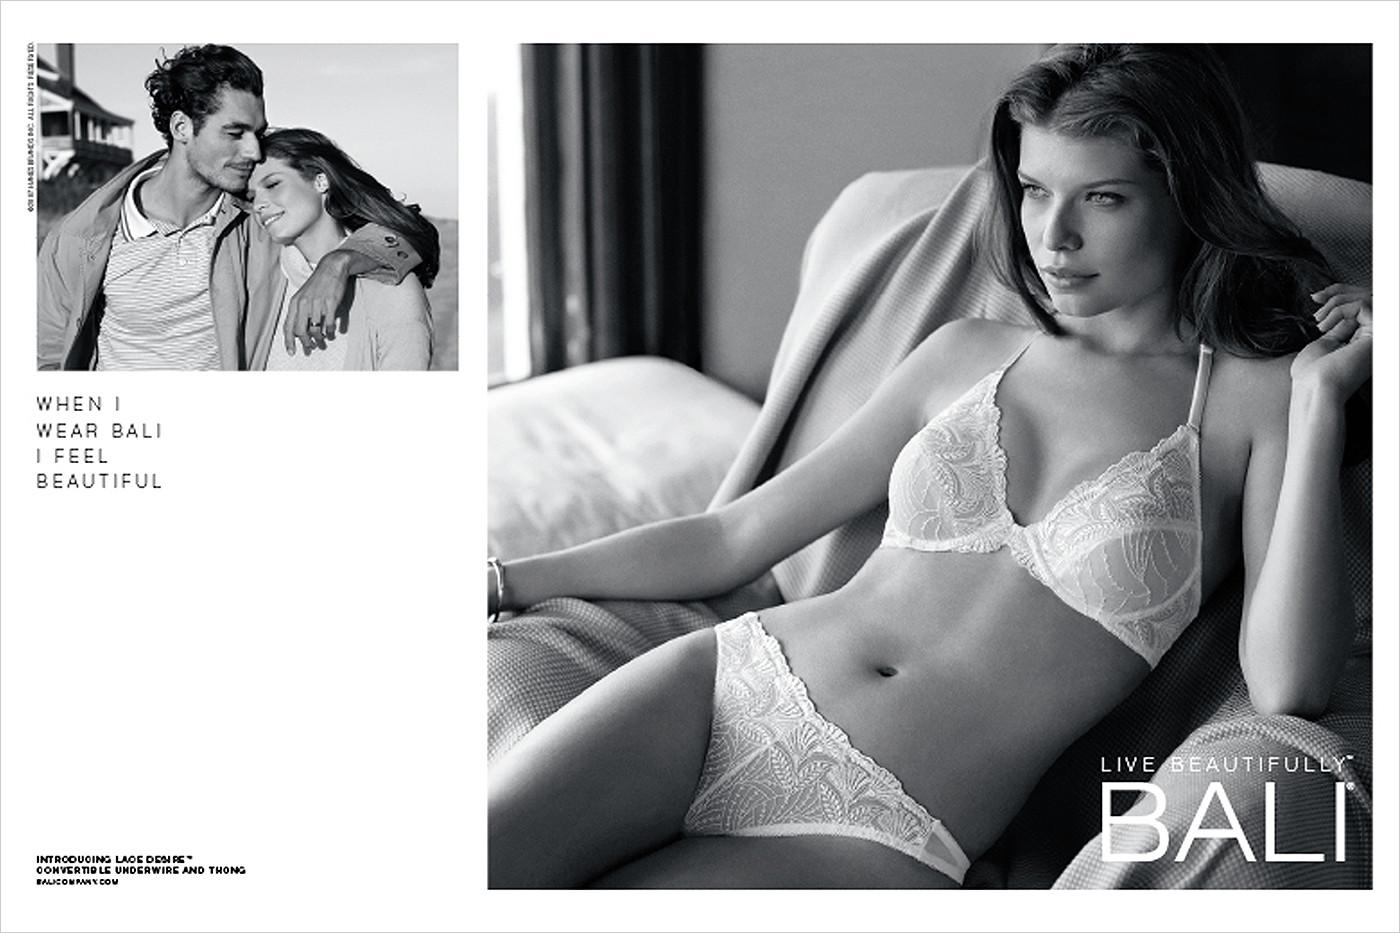 Bali-Concealers-White-jacket-with-boyfriend-Print-3000x2000.jpg